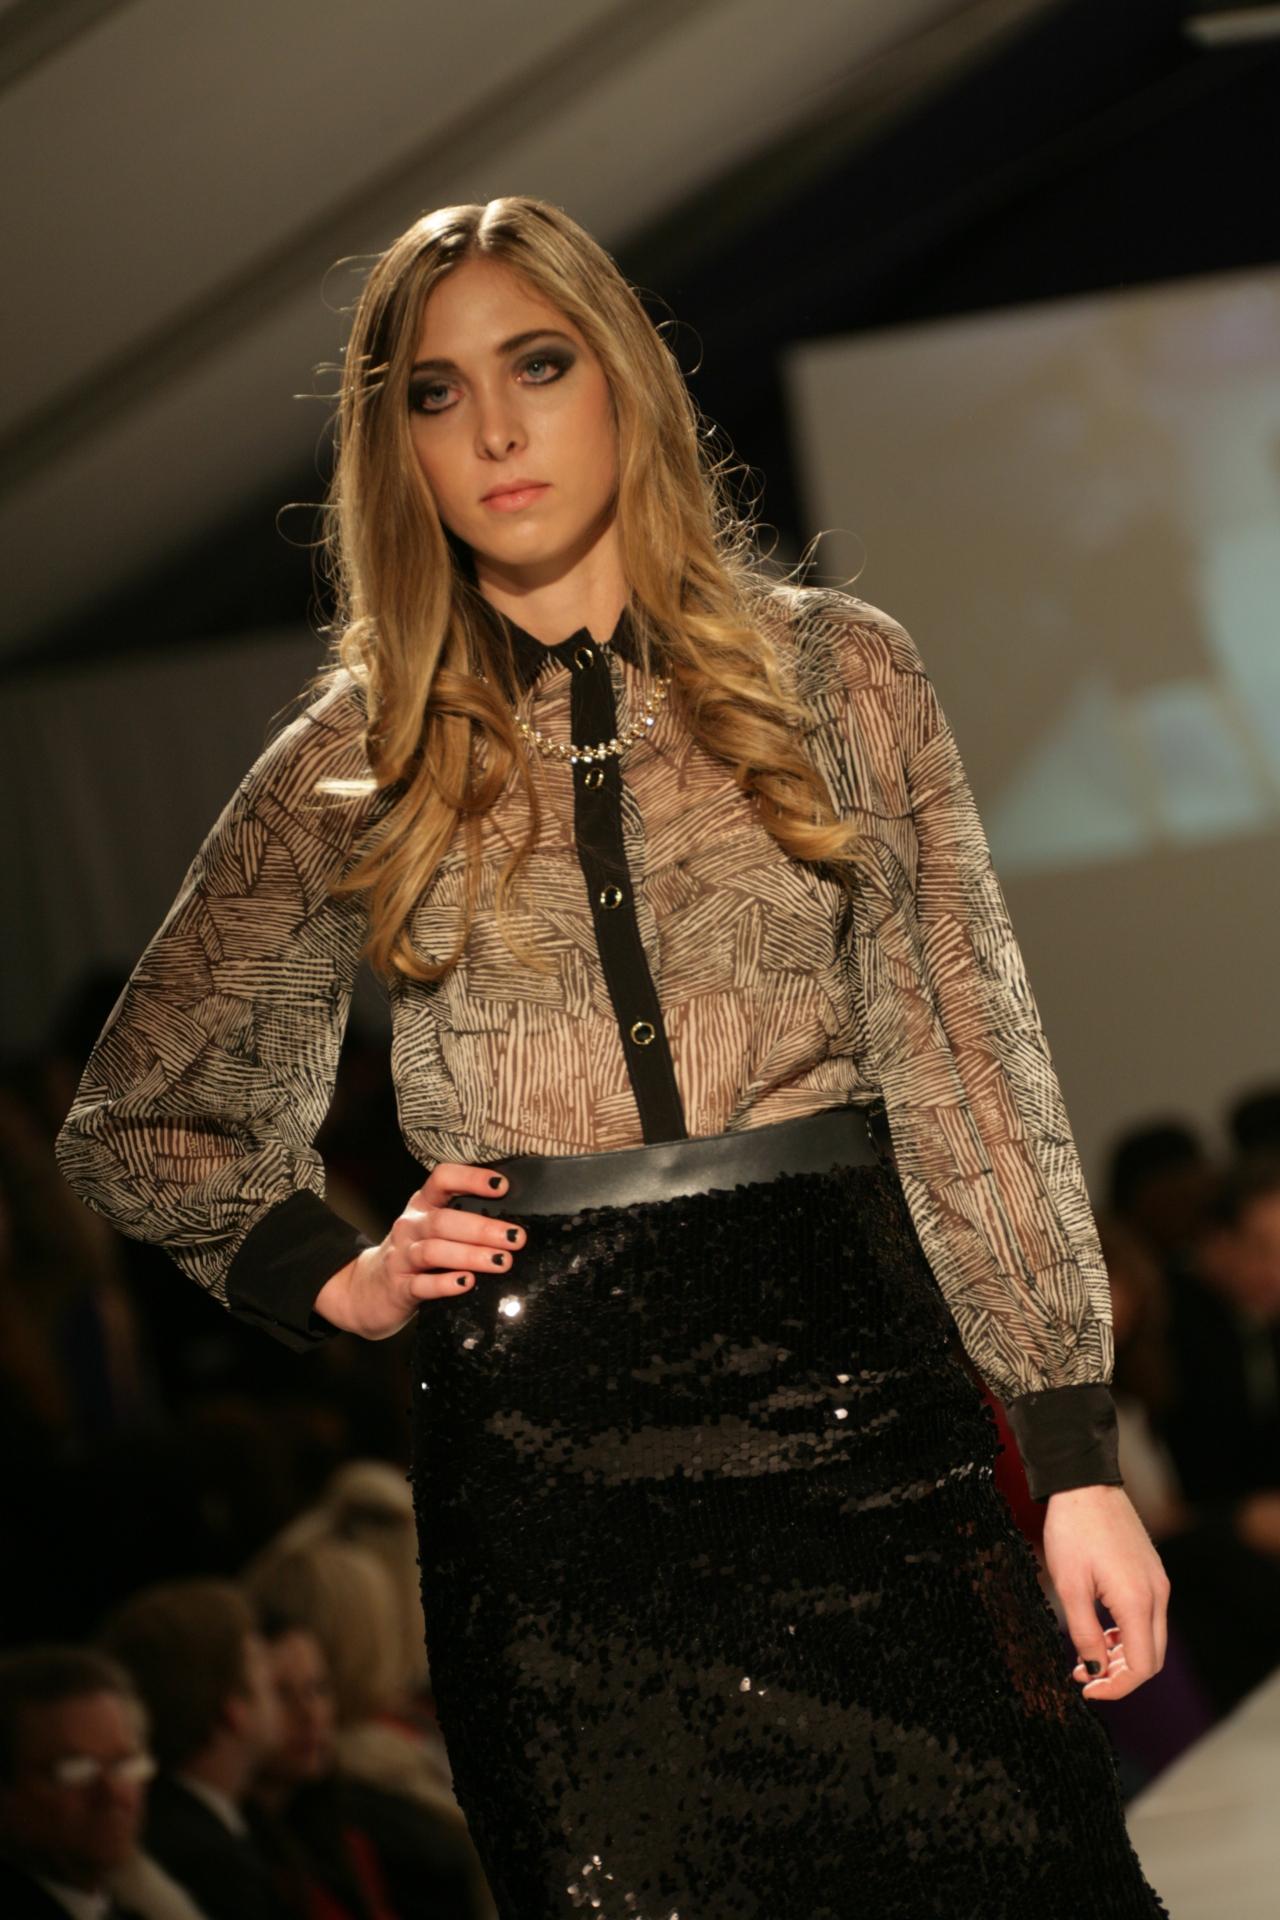 Allison Mills' Collection | Birmingham Fashion Week 2013Photo Credit: Vintage Inspired Passionista